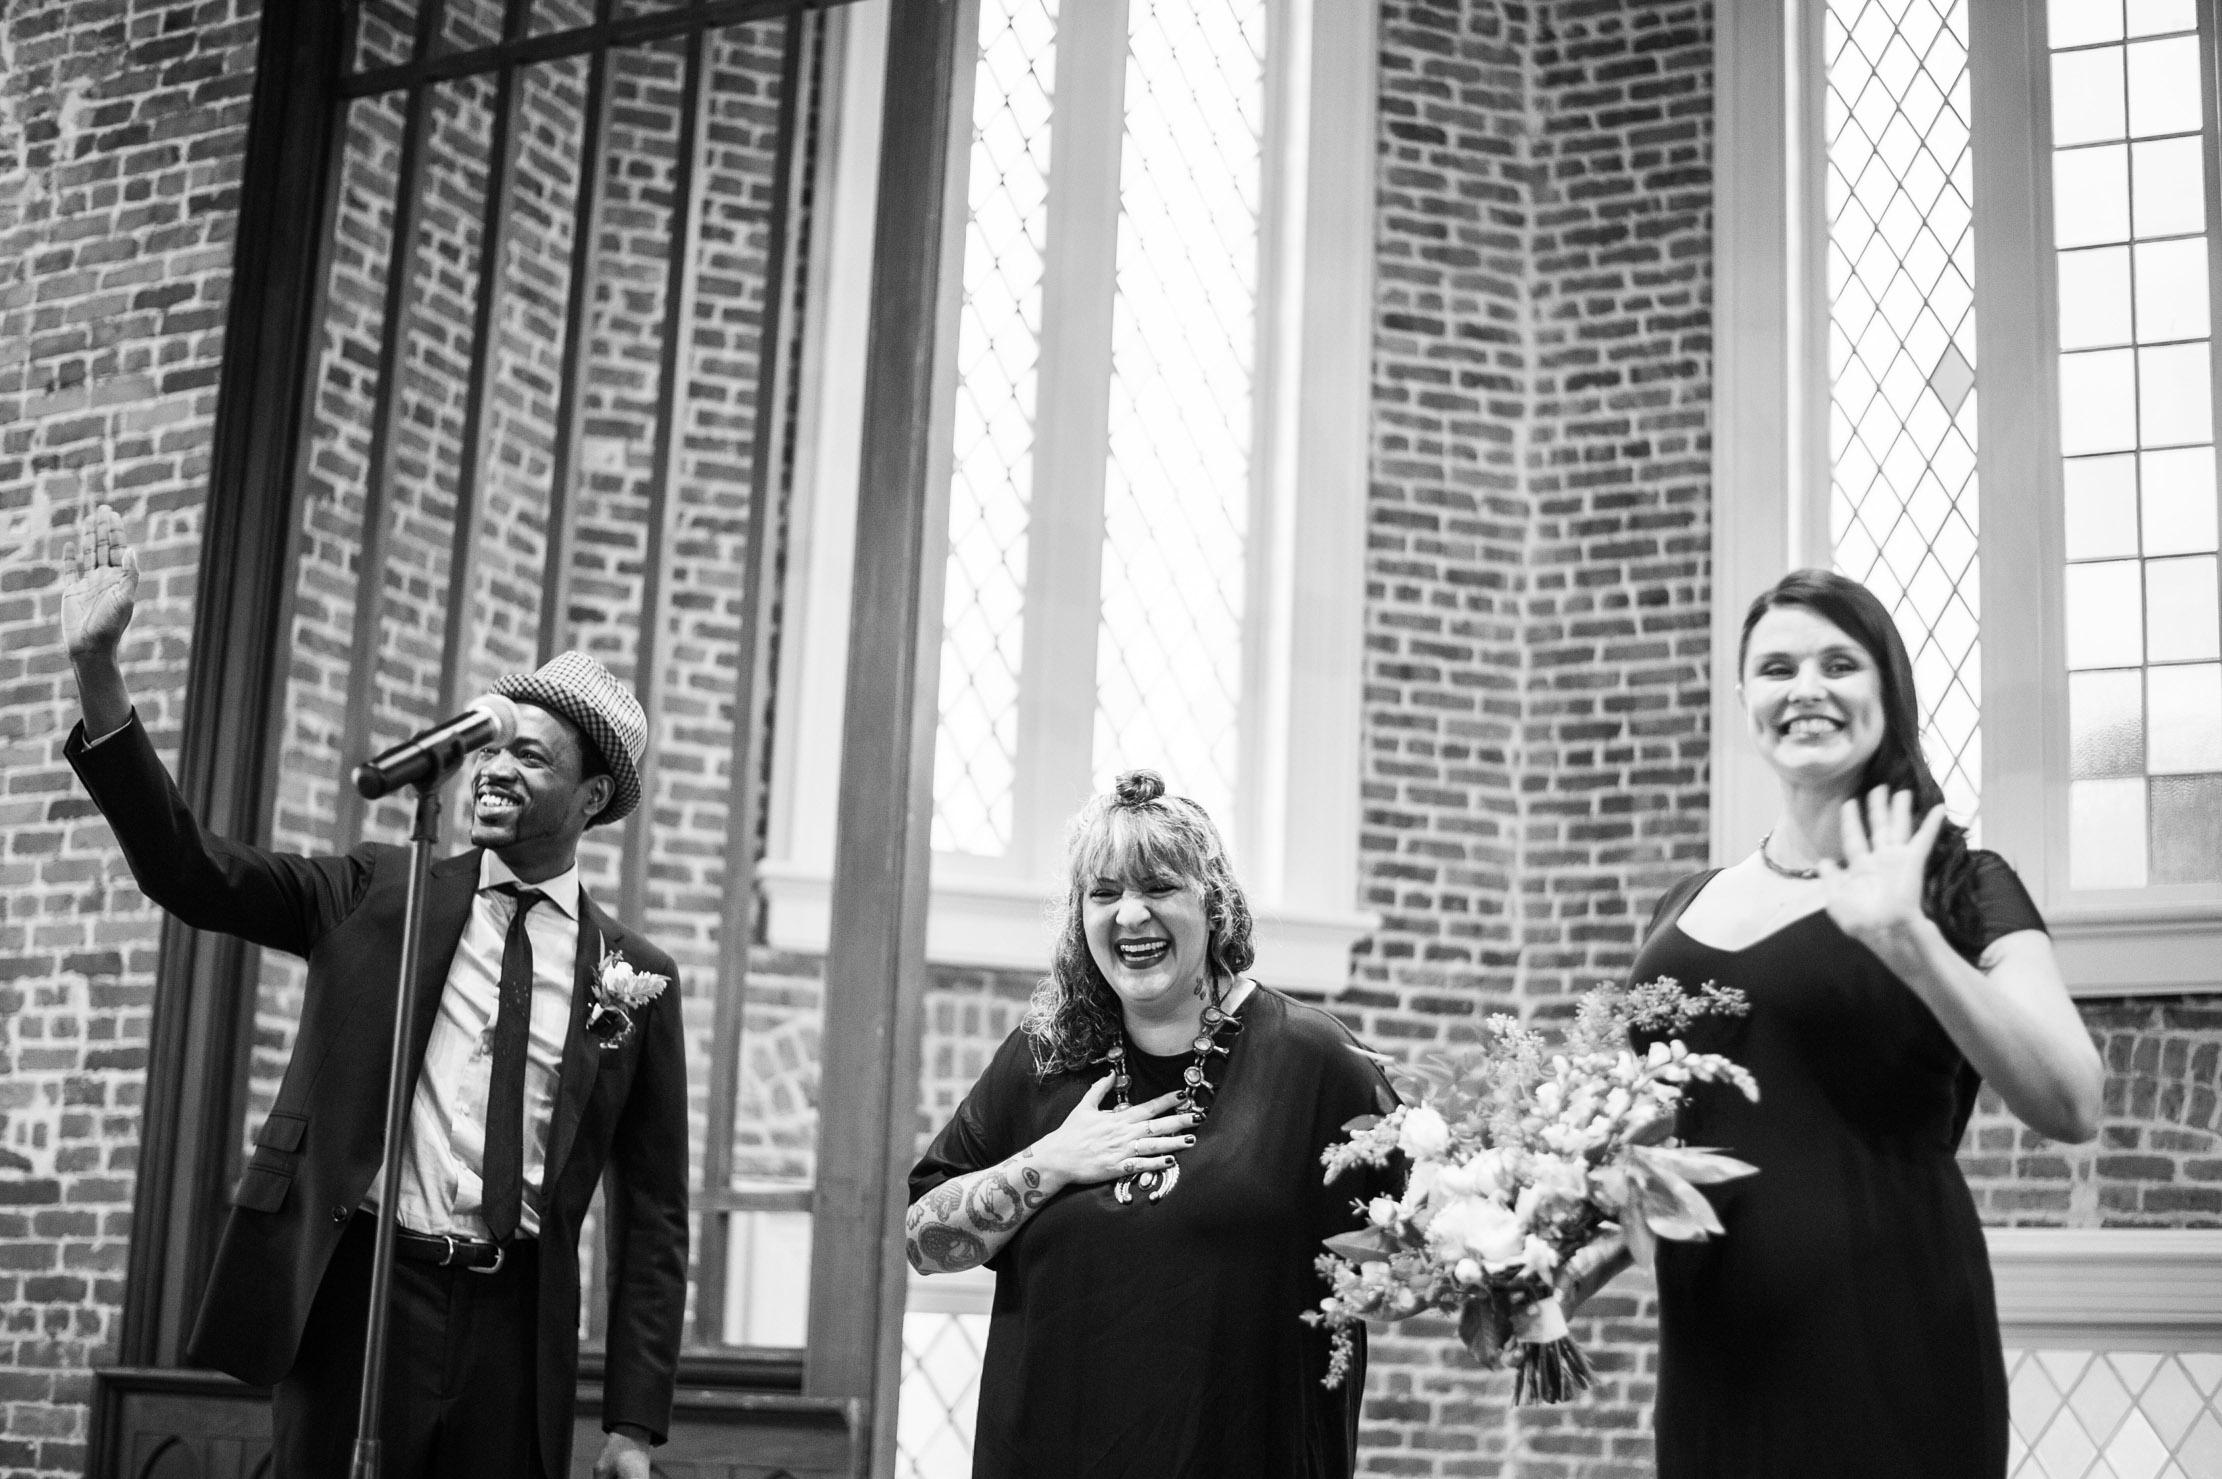 NOLA-Felicity-Church-Ace-Hotel-Wedding-1068.jpg